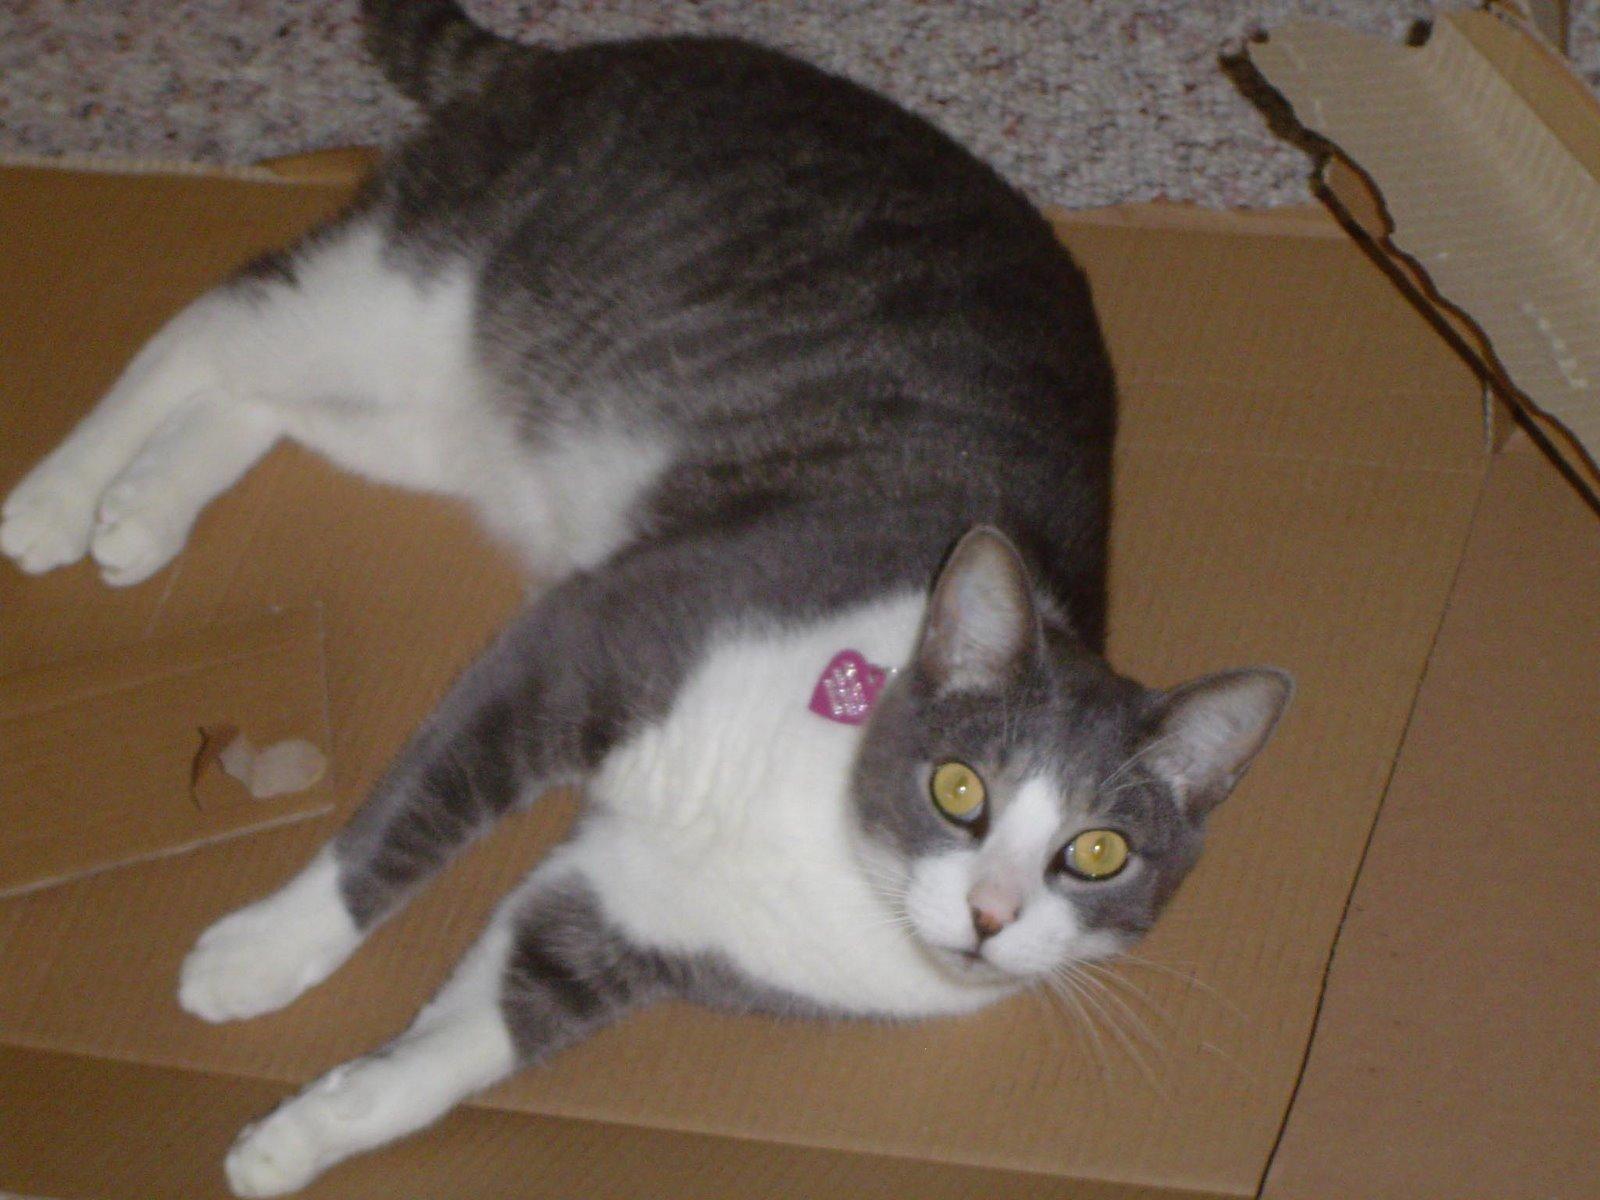 [Prancer+and+Ikea+Box3-091804.jpg]